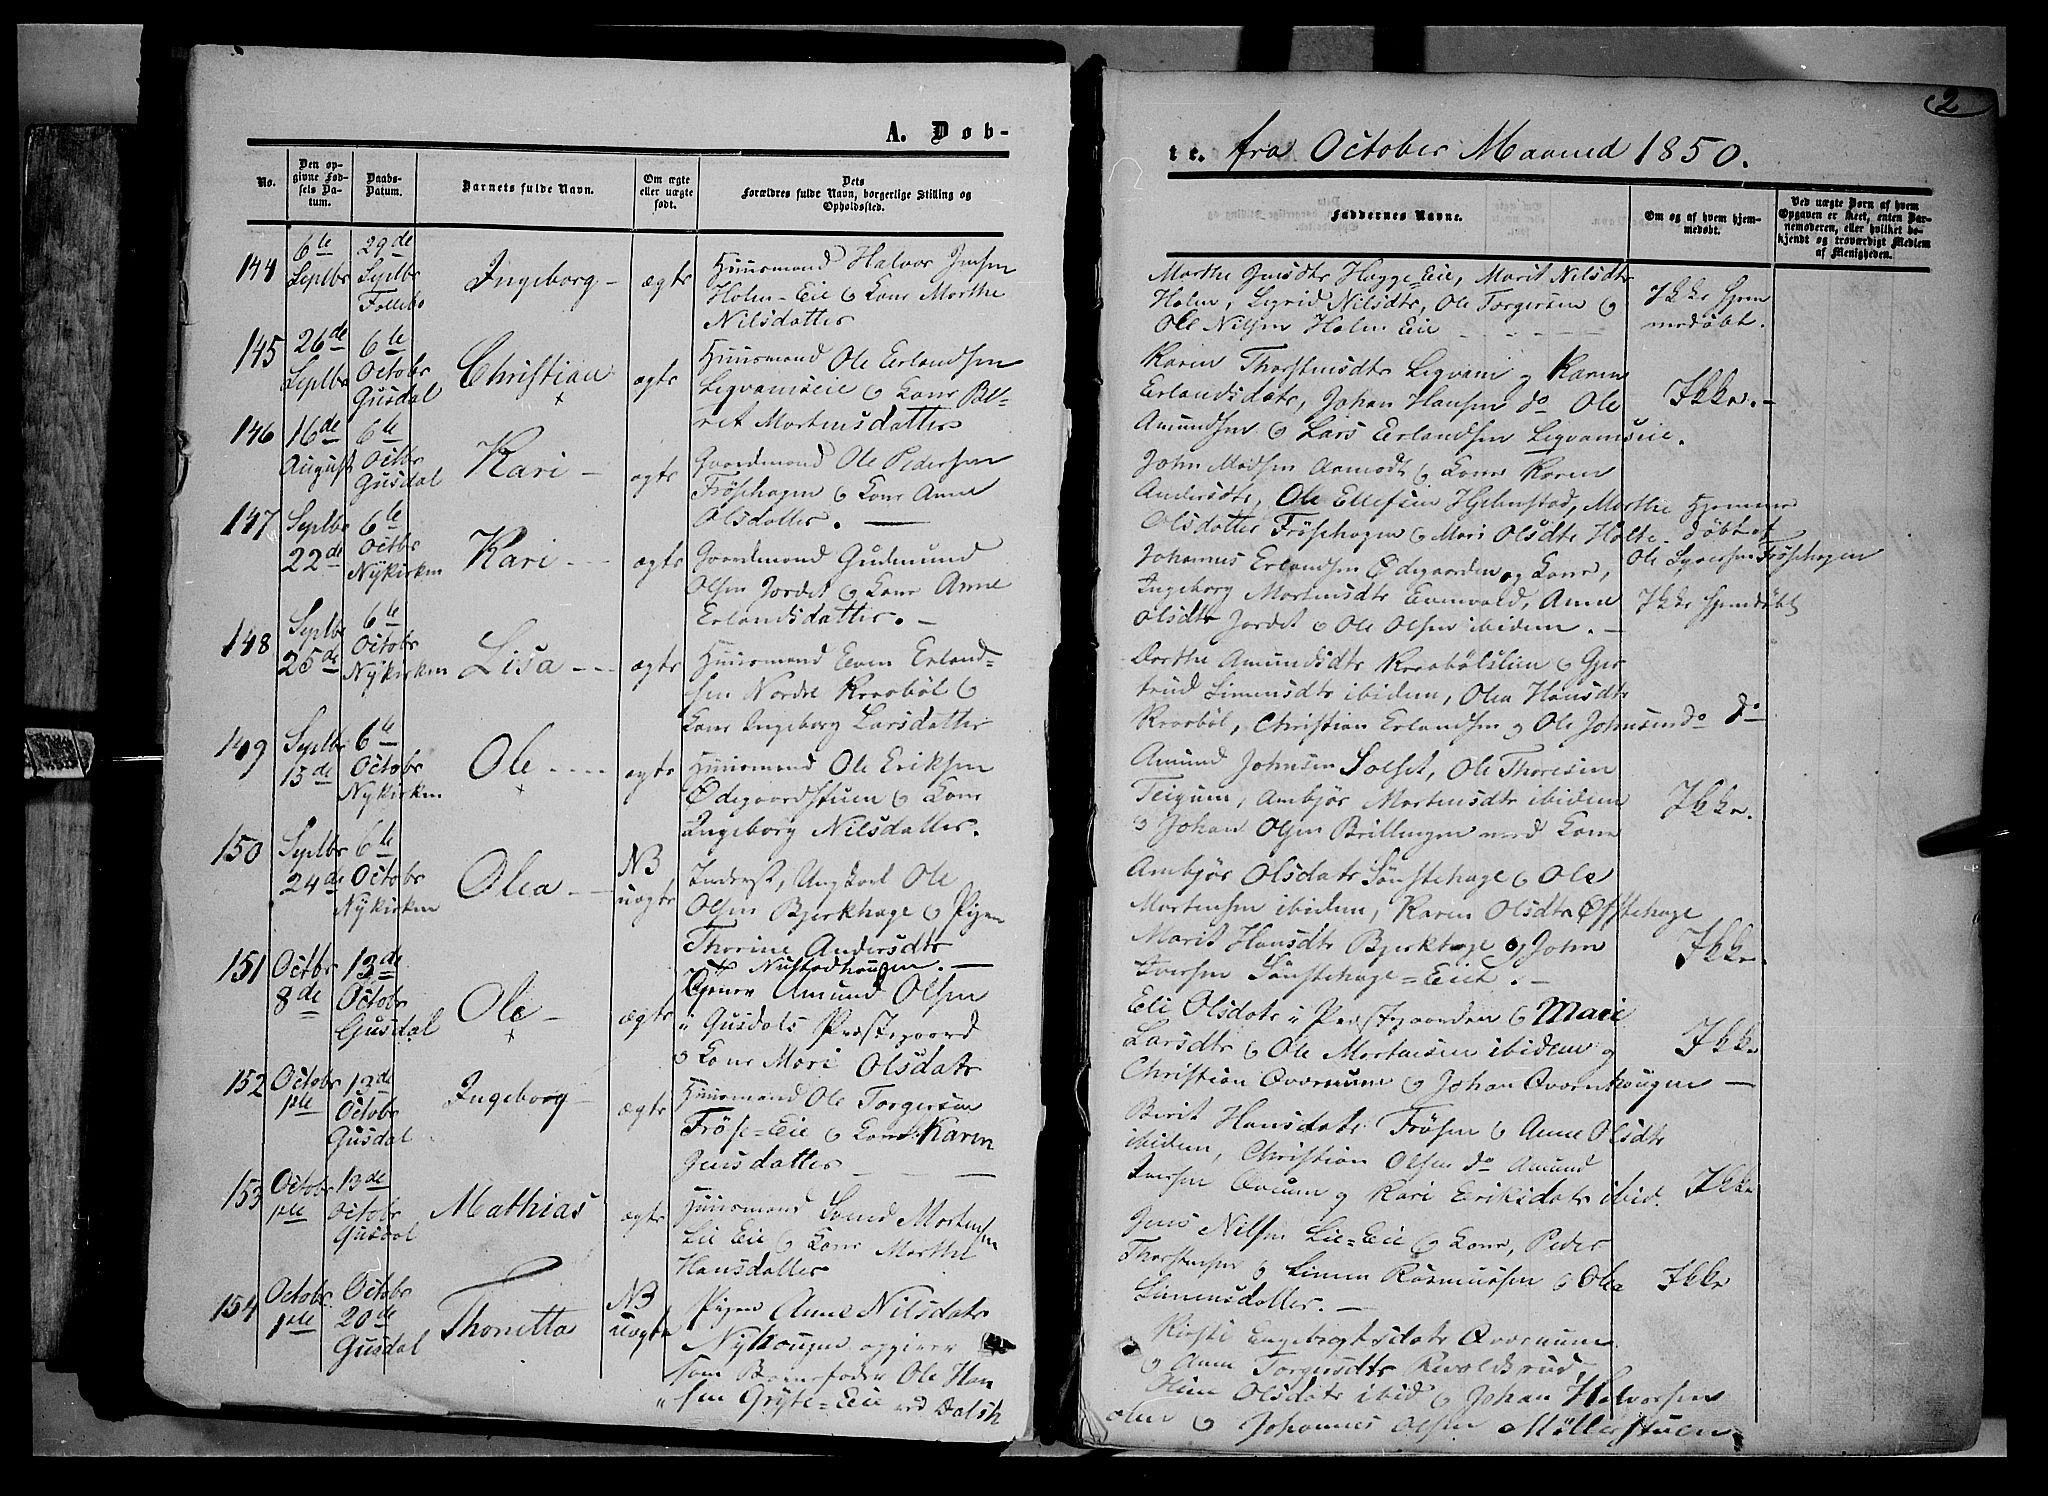 SAH, Gausdal prestekontor, Ministerialbok nr. 8, 1850-1861, s. 2